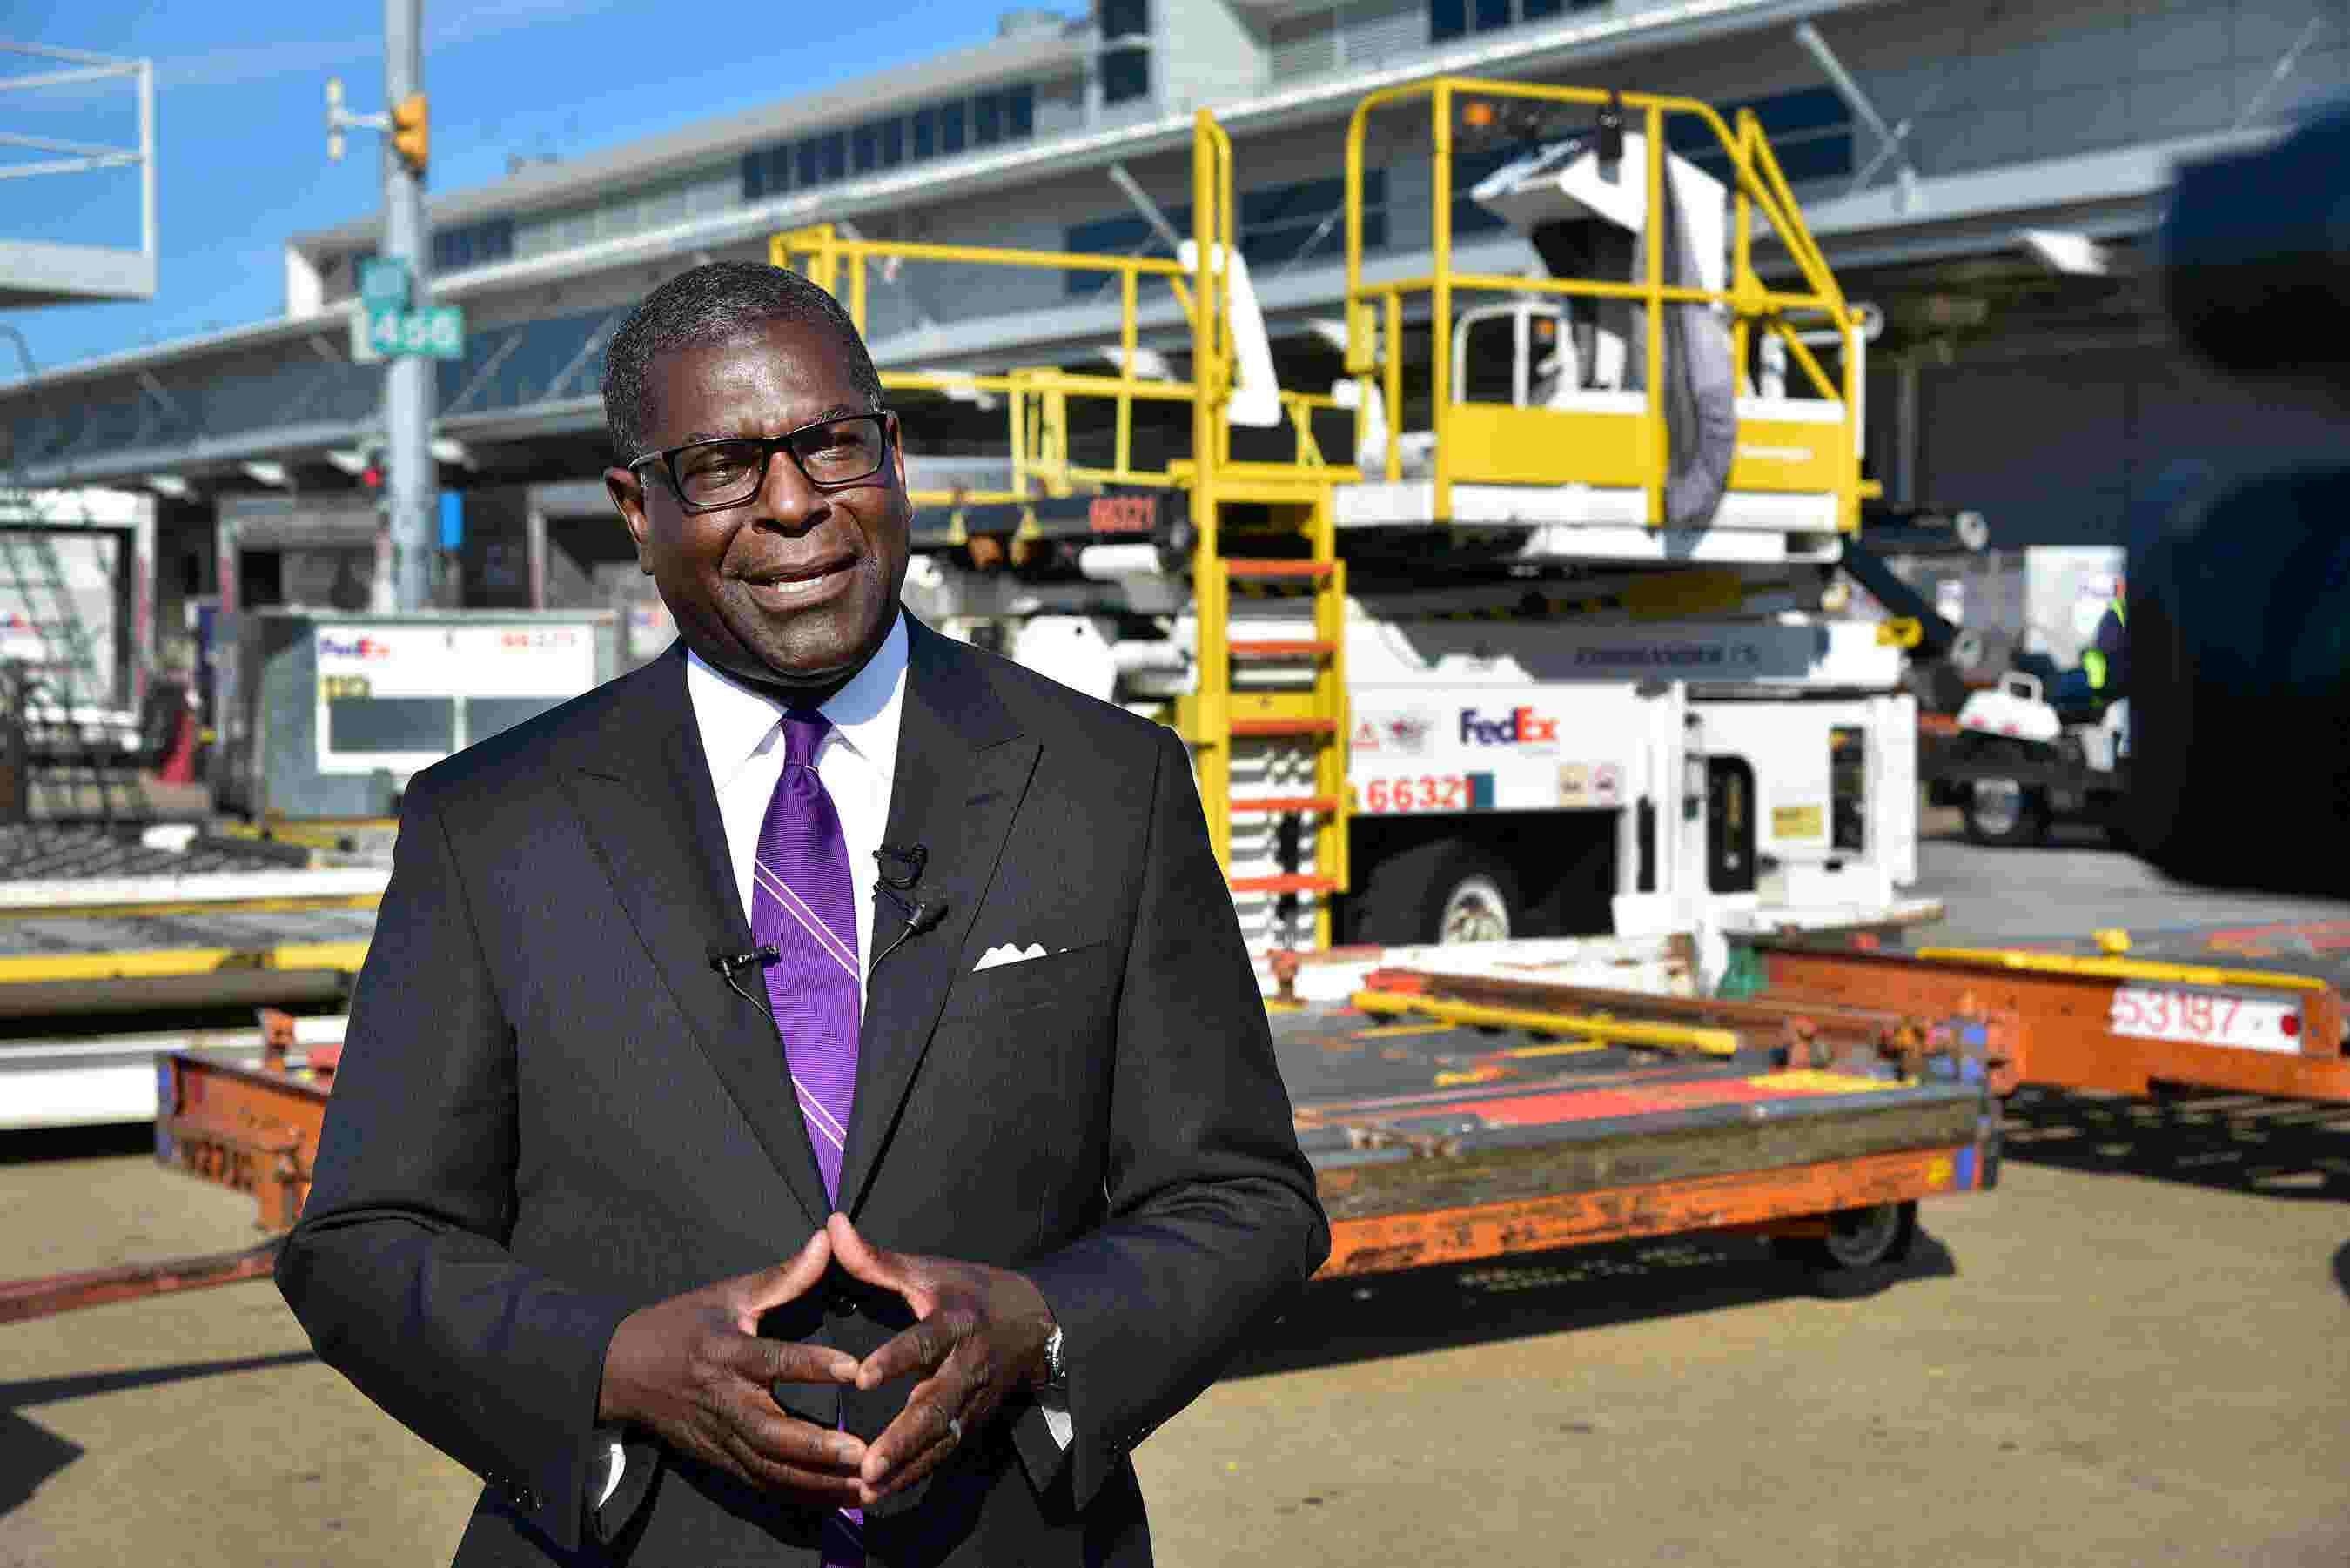 FedEx exec talks adding 3,800 seasonal workers in Memphis